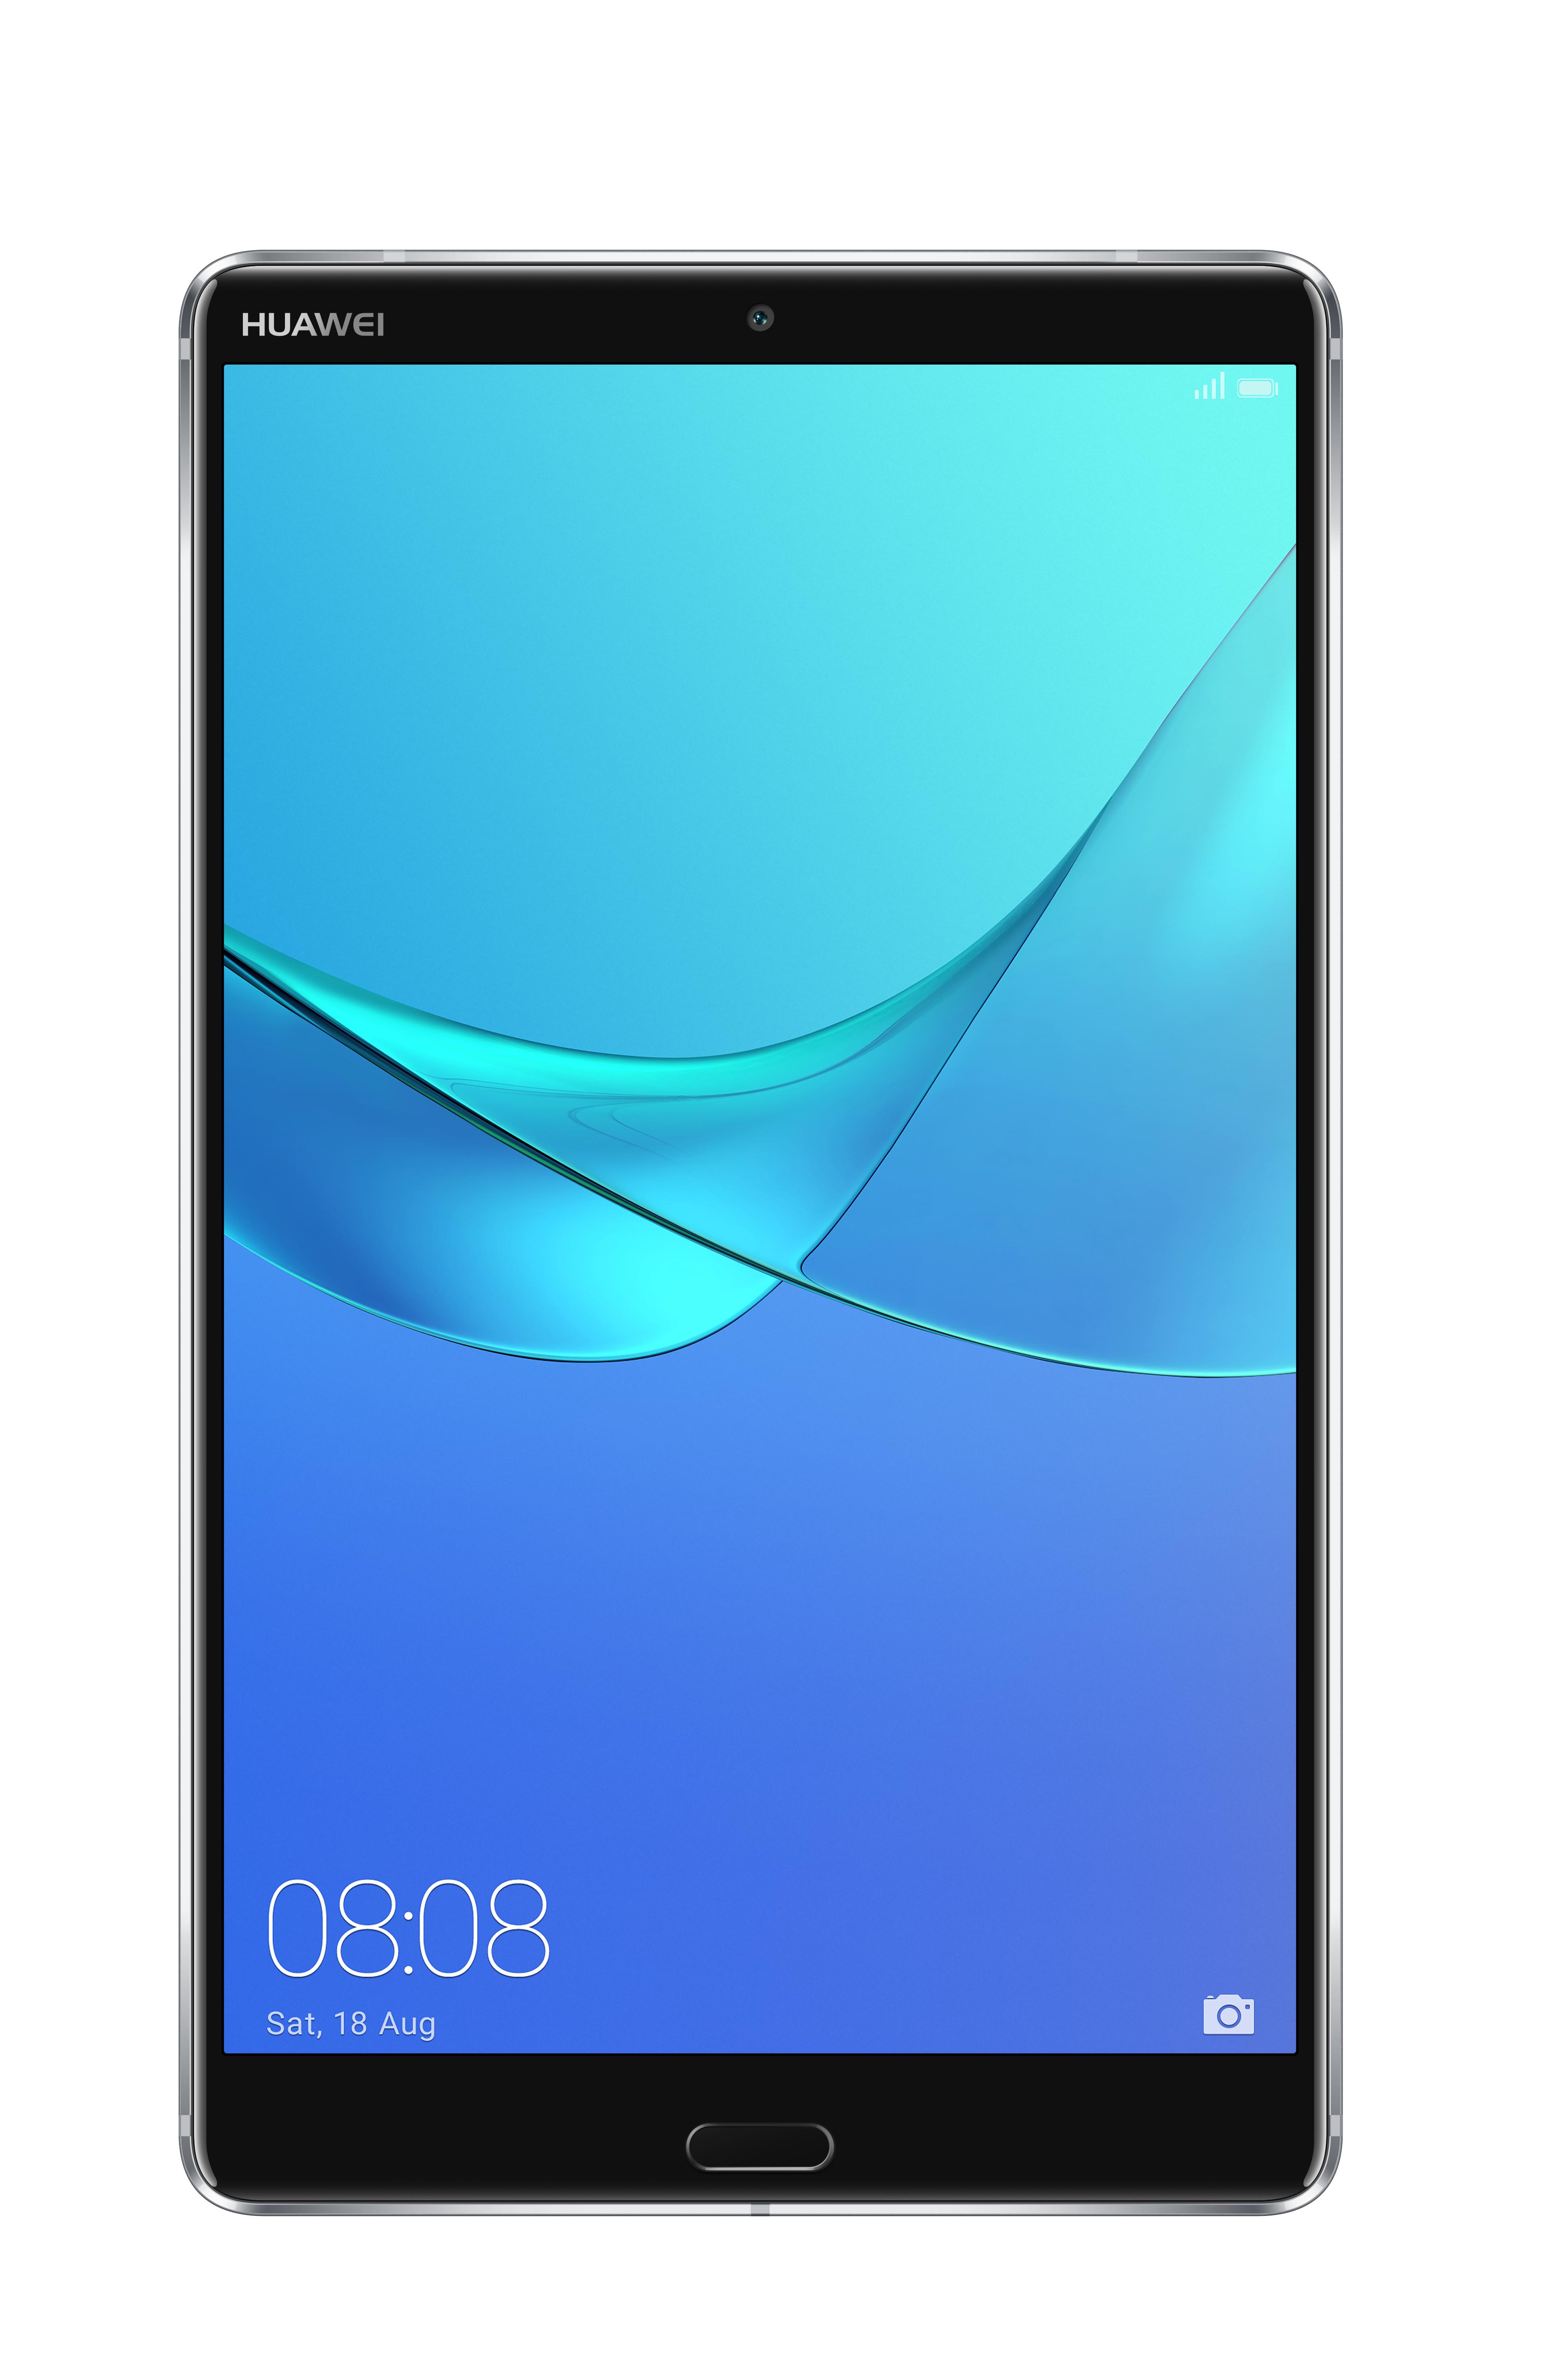 Huawei MediaPad M5 8 Tablet 8 4 2K IPS Display Octa Core